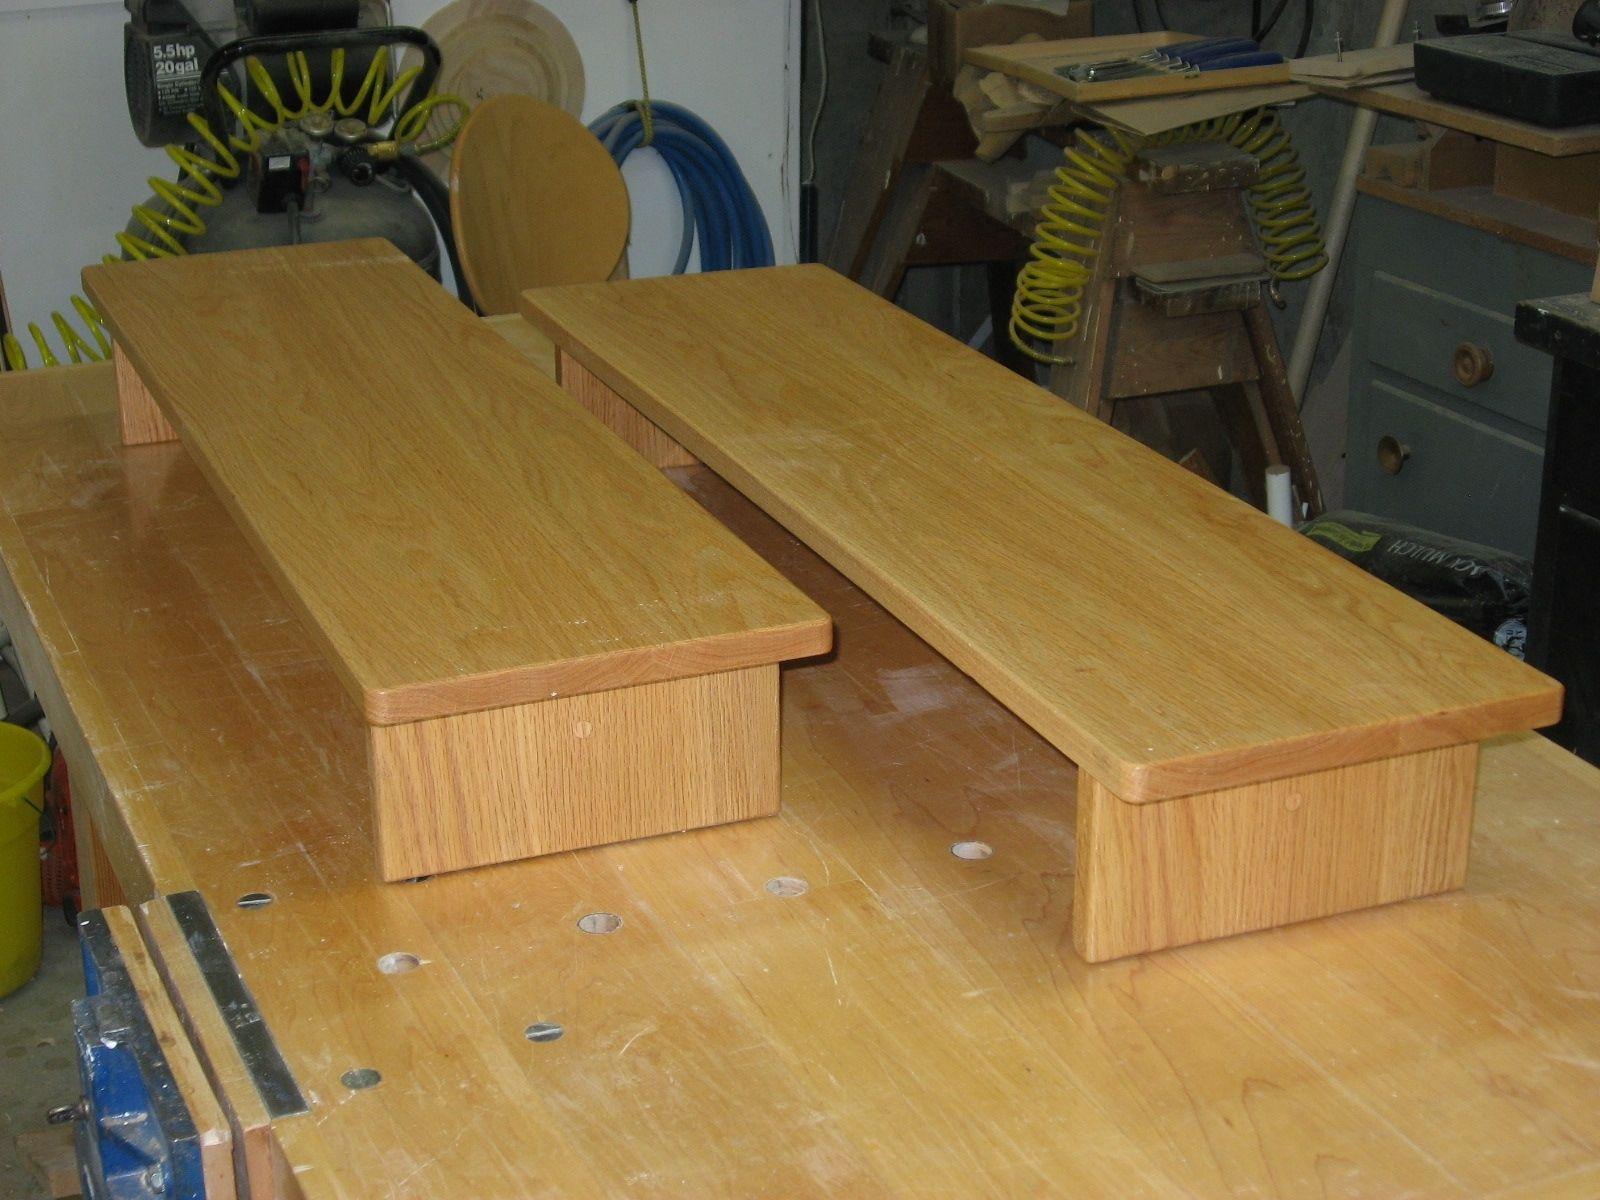 bedroom chair m&s computer floor mat handmade oak bed steps by batterman 39s custom woodworking